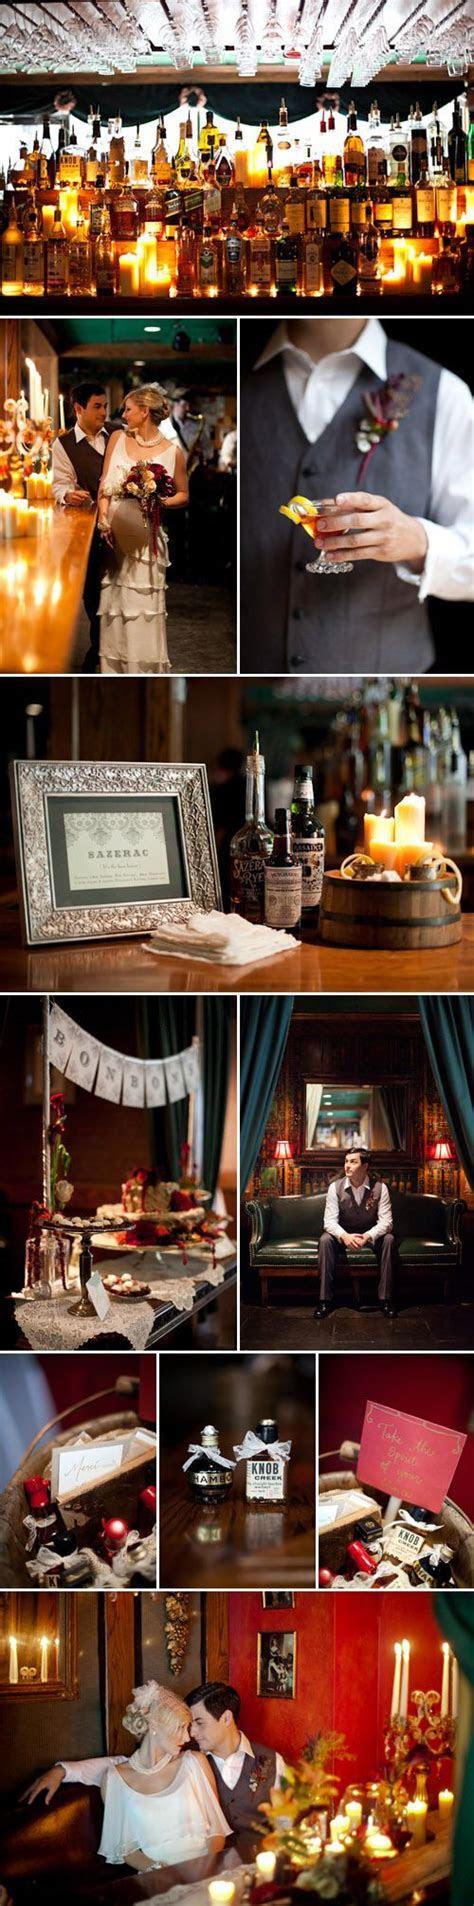 1920s Paris and New Orleans Wedding Inspiration   Wedding